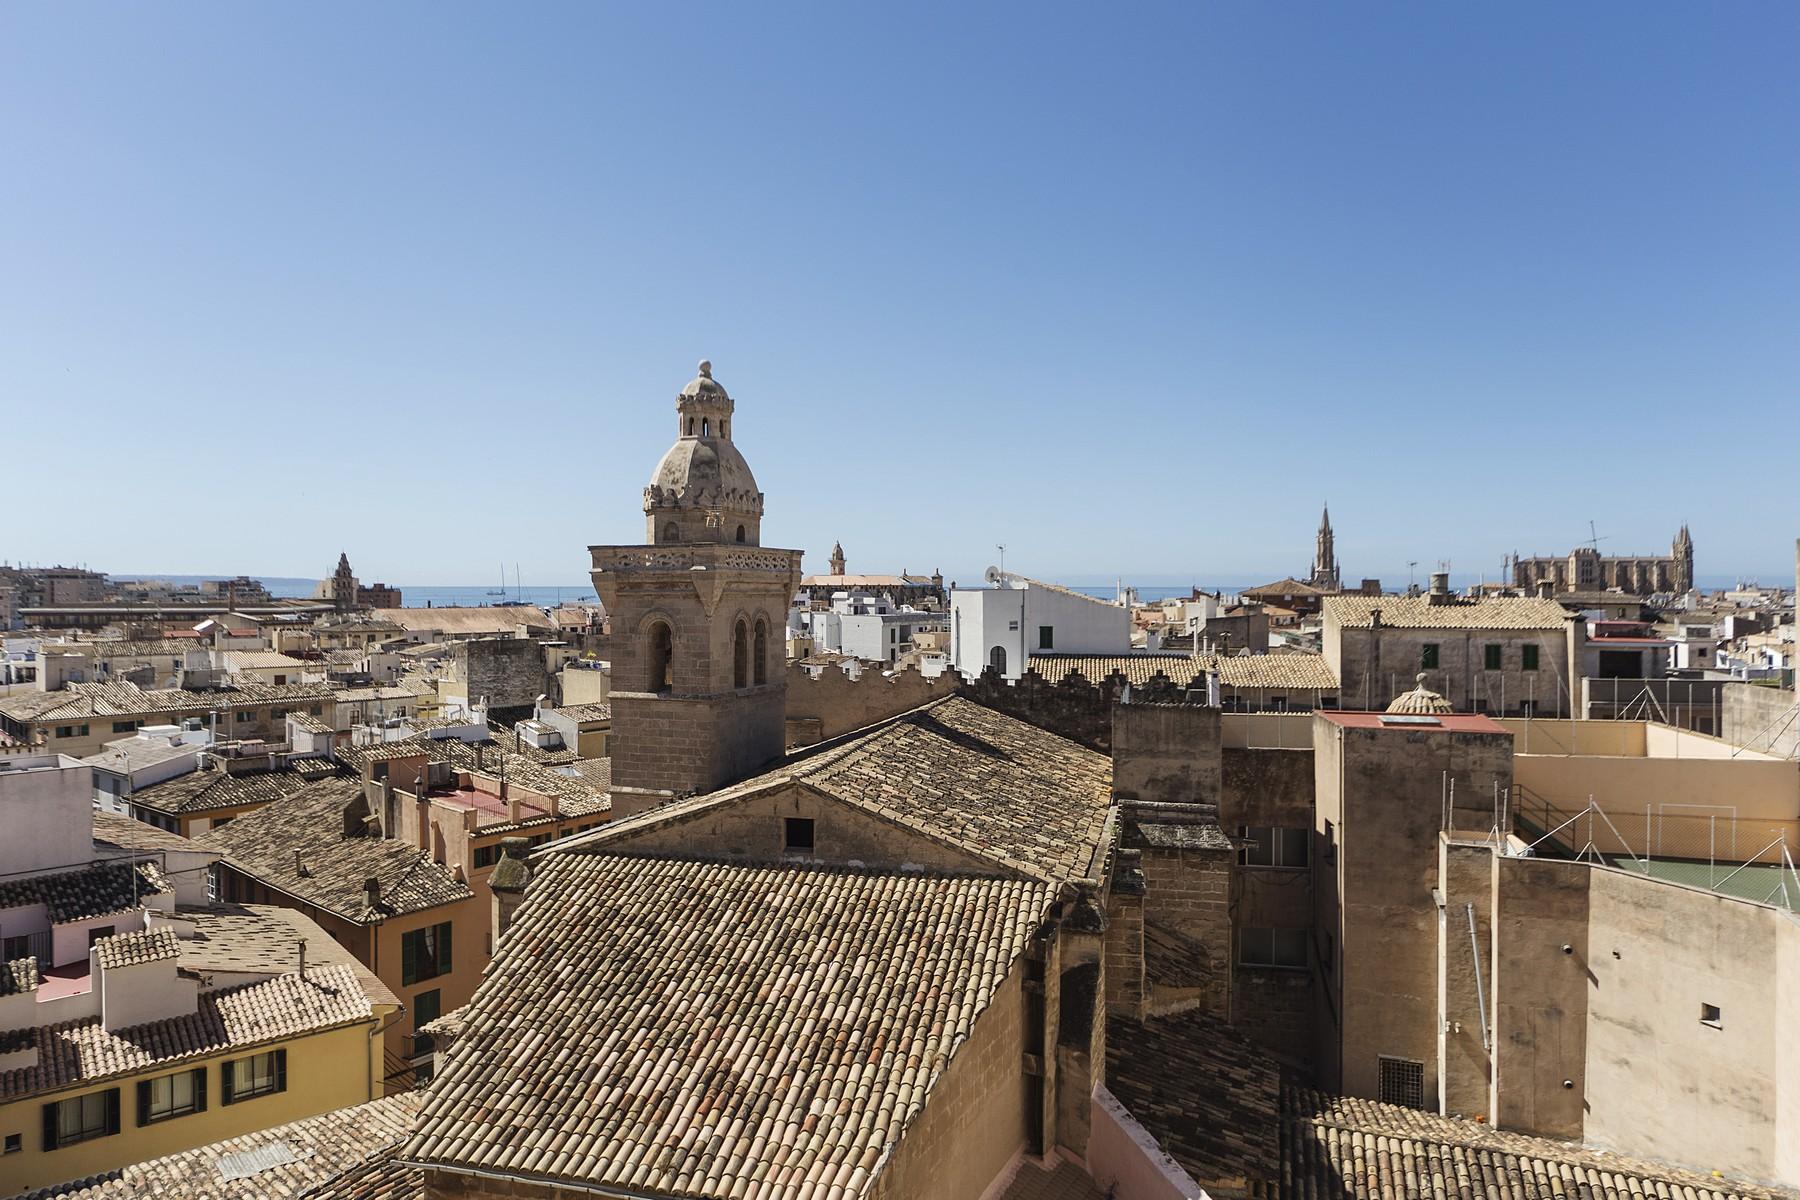 Moradia para Arrendamento às Penthouse with views in Palma for rent Palma, Palma De Maiorca, Espanha